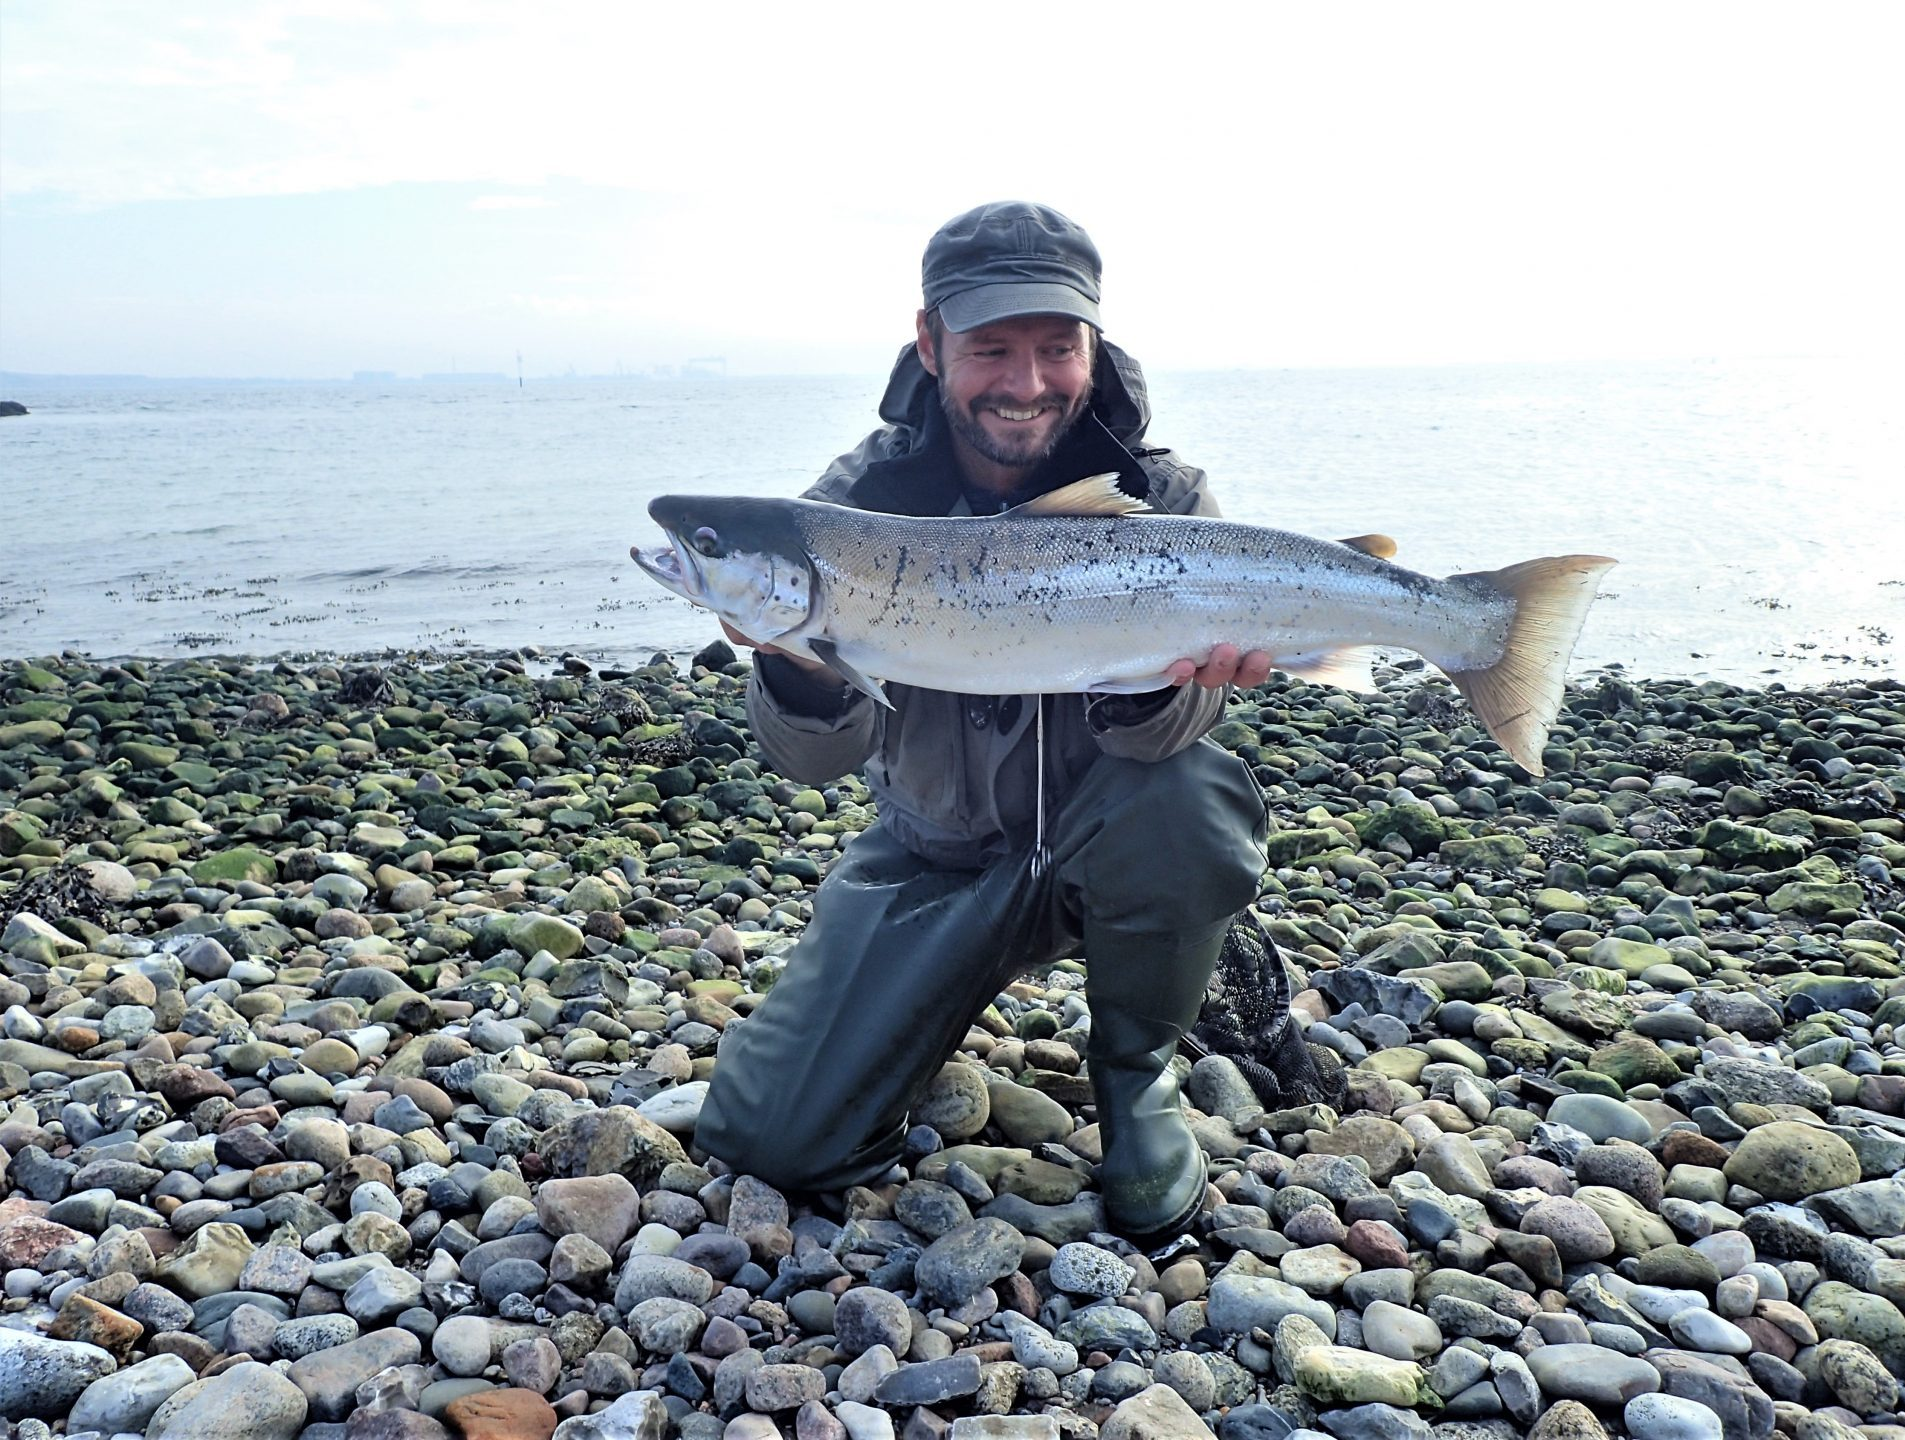 Kystfiskeri - det rette fokus.